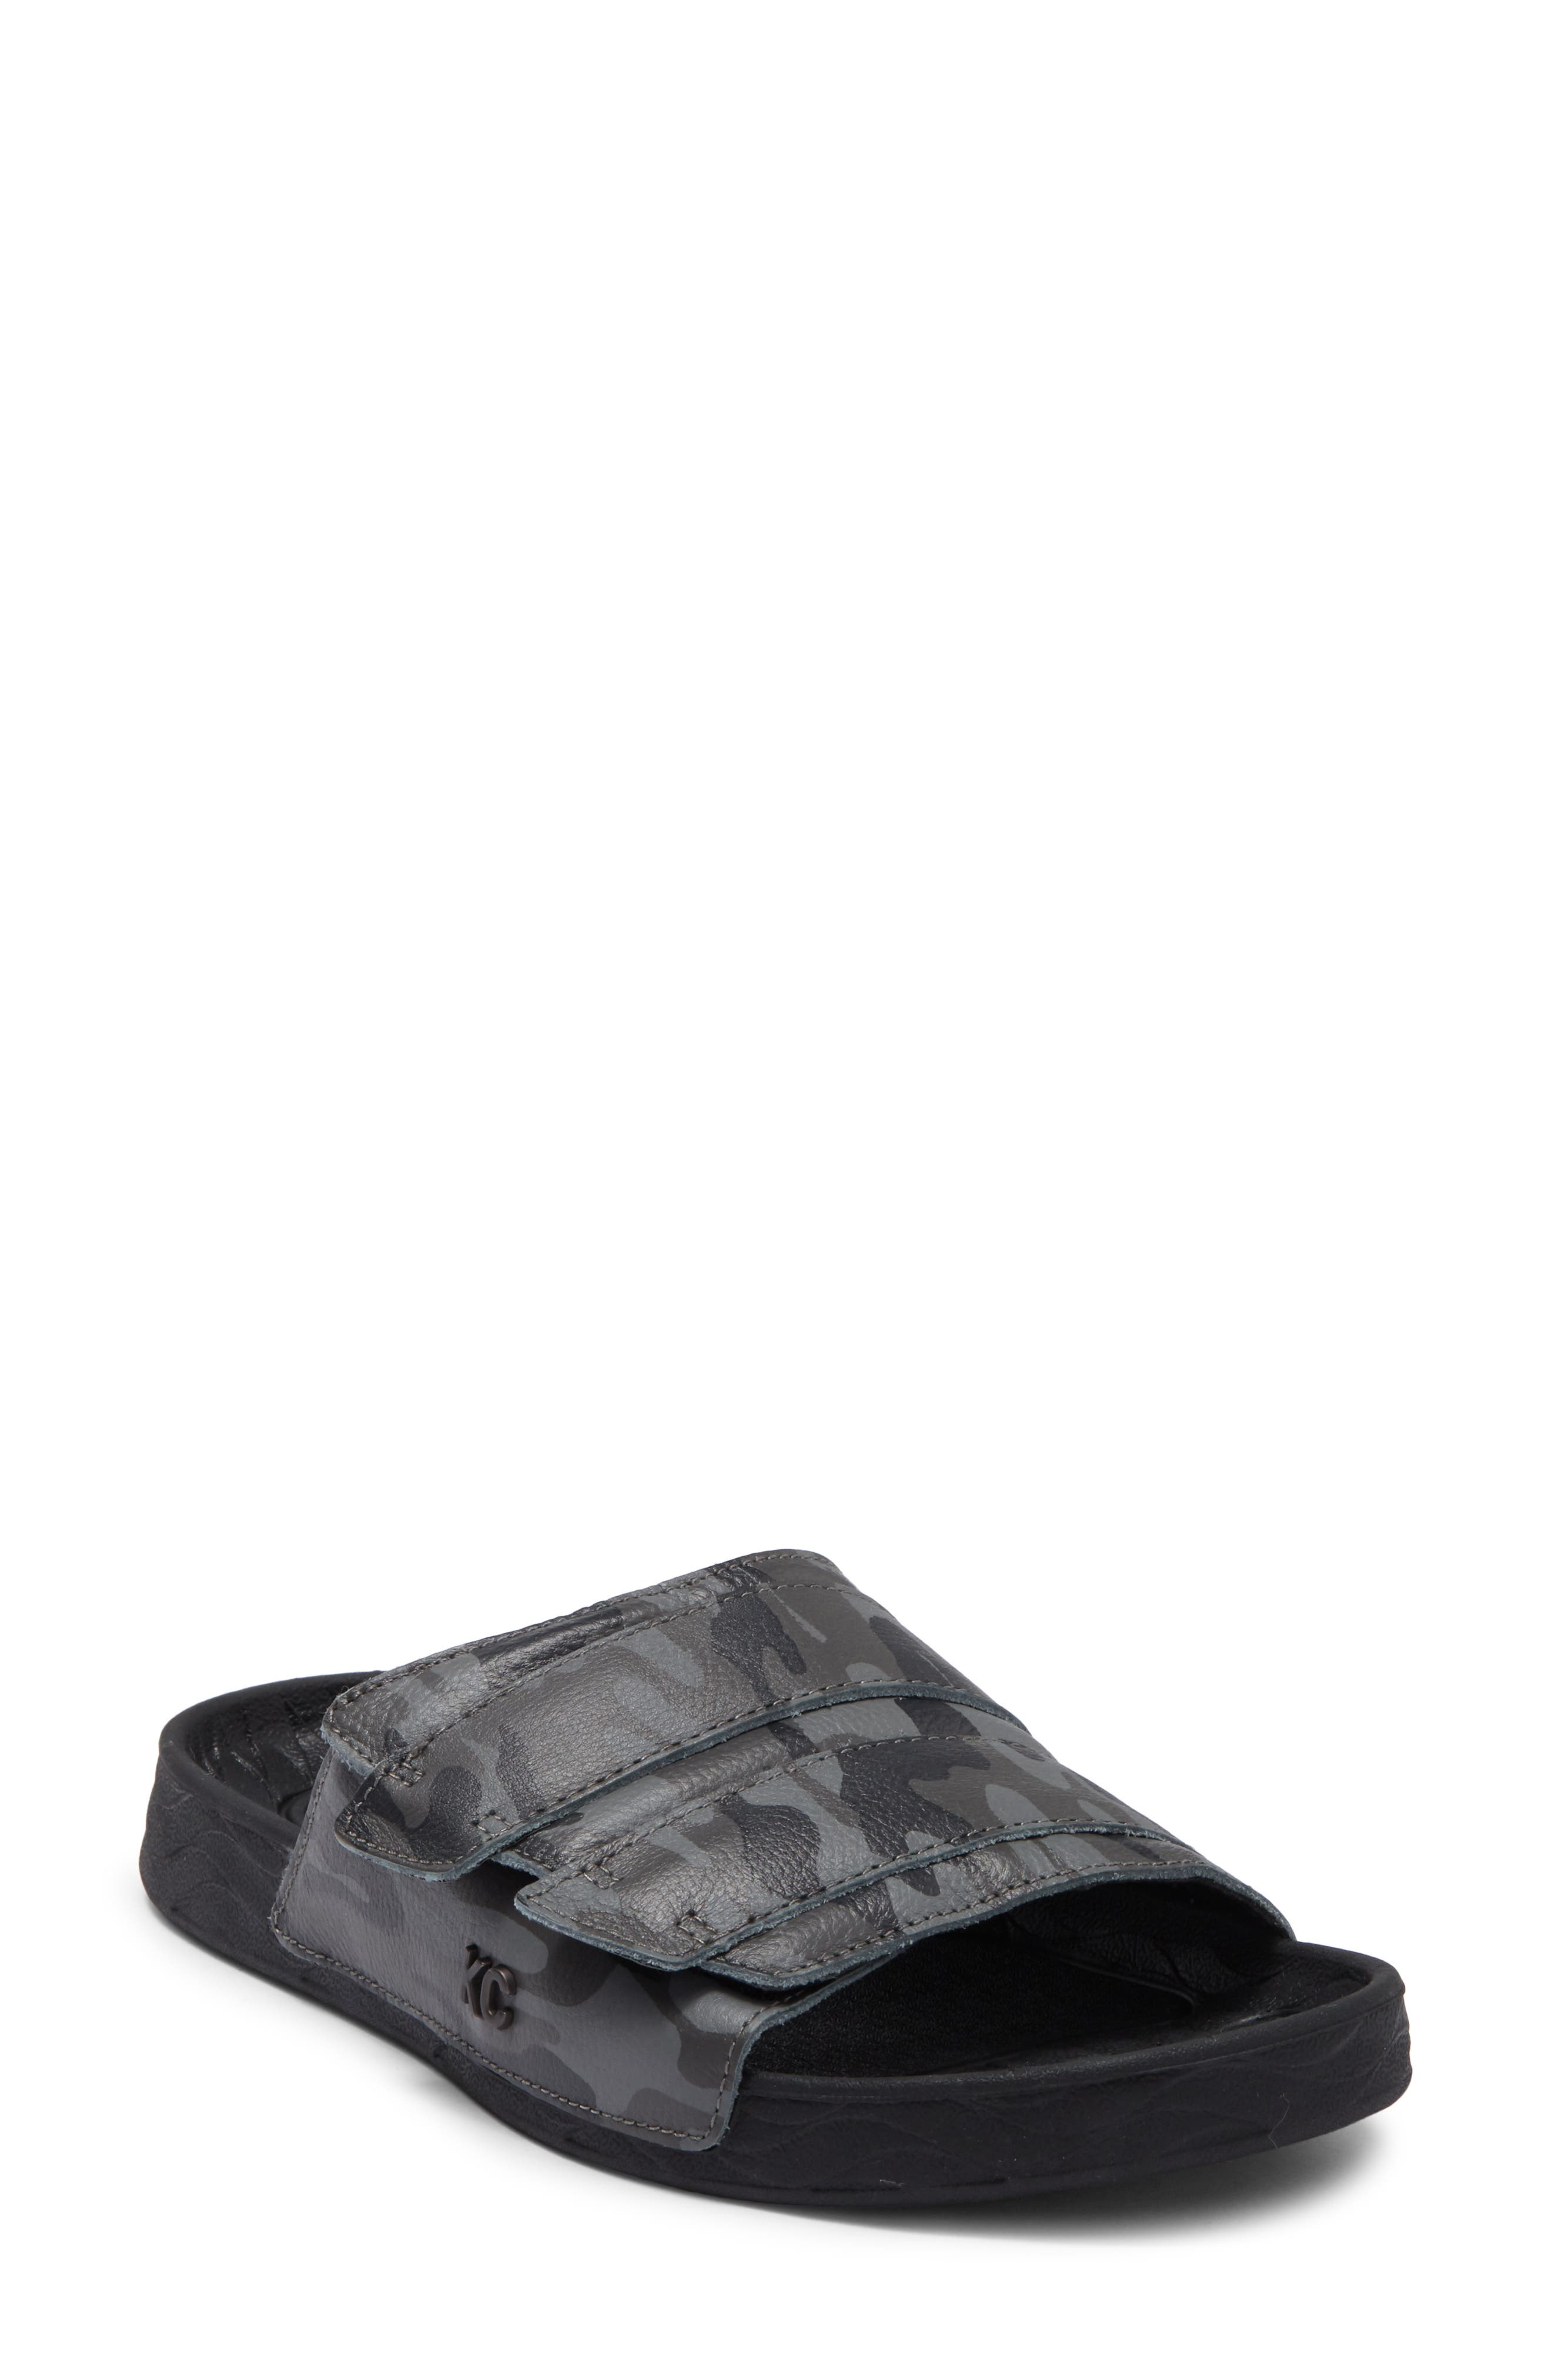 Image of Kenneth Cole New York Nico Slide Sandal